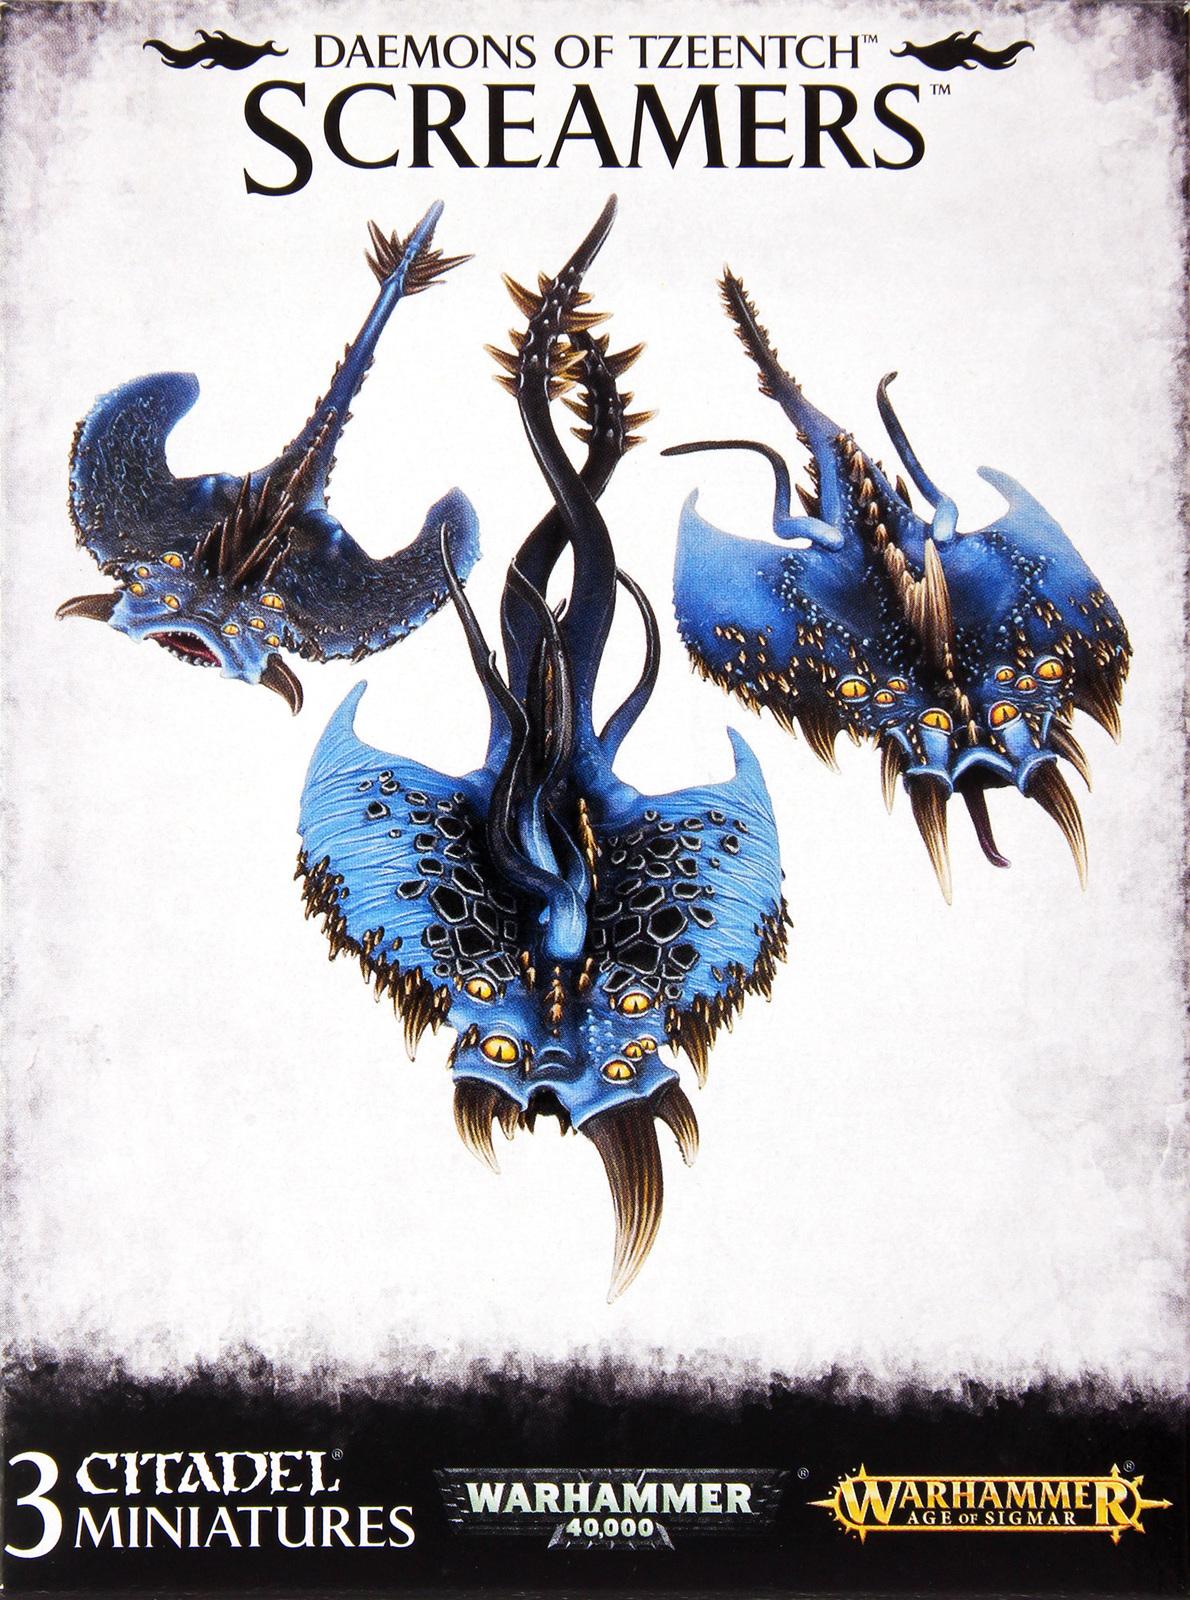 Warhammer Tzeentch Daemons: Screamers image